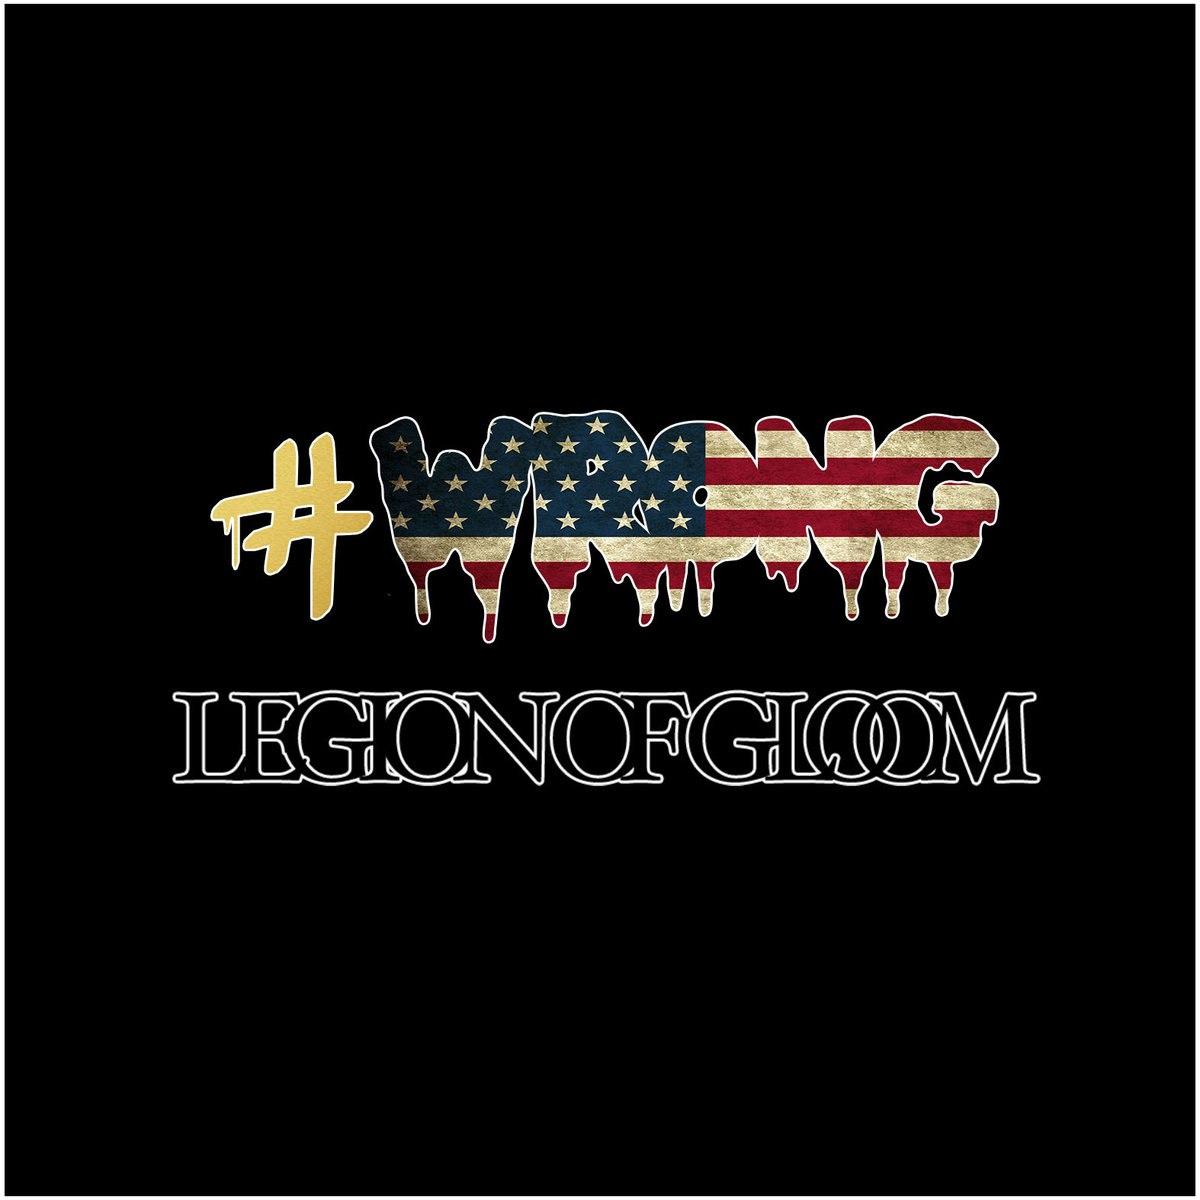 Legion of Gloom - #WRONG [single] (2016)